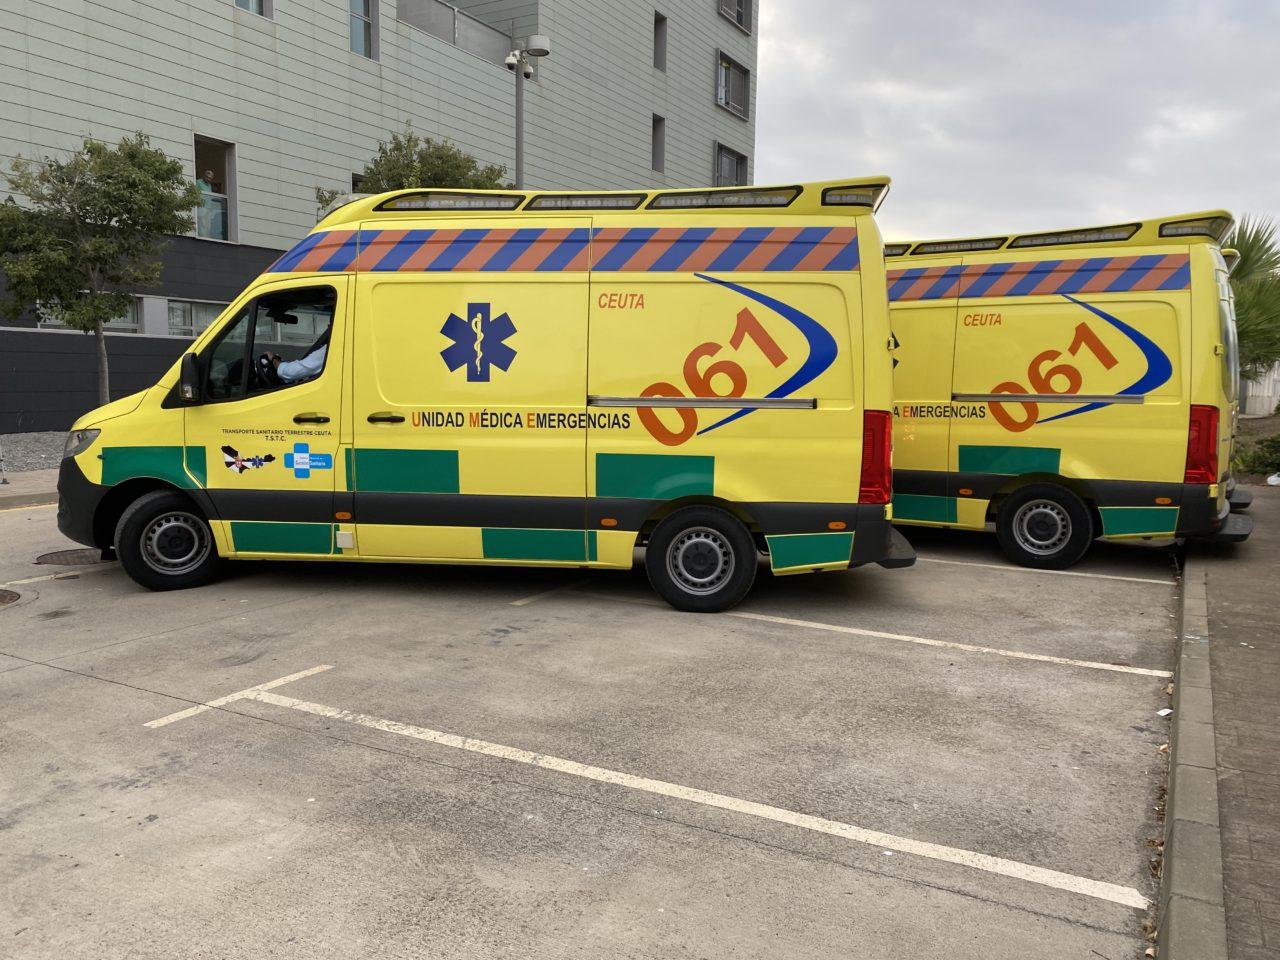 https://ambulancias-malaga.com/wp-content/uploads/2020/07/IMG_4051-1280x960.jpg